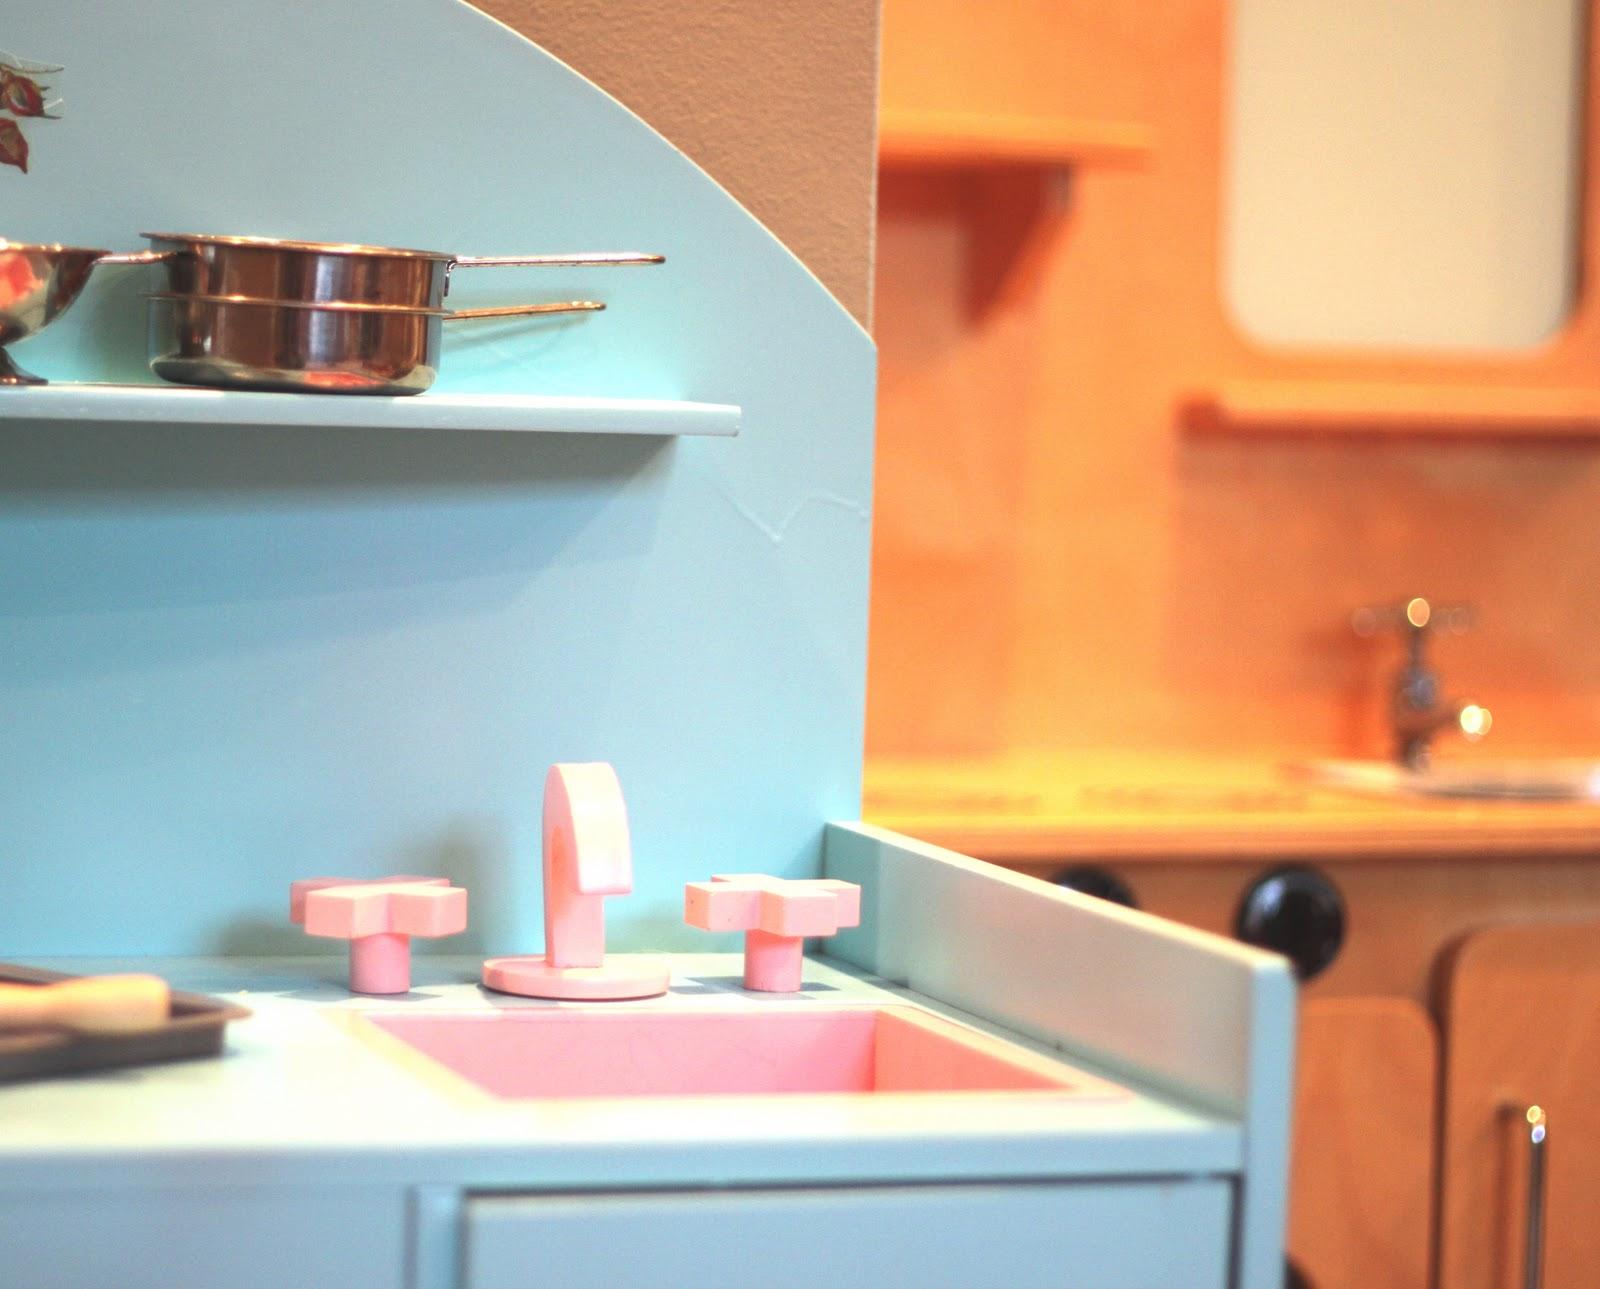 Corey Moortgat- Collage Artist: The Play Kitchen(s)